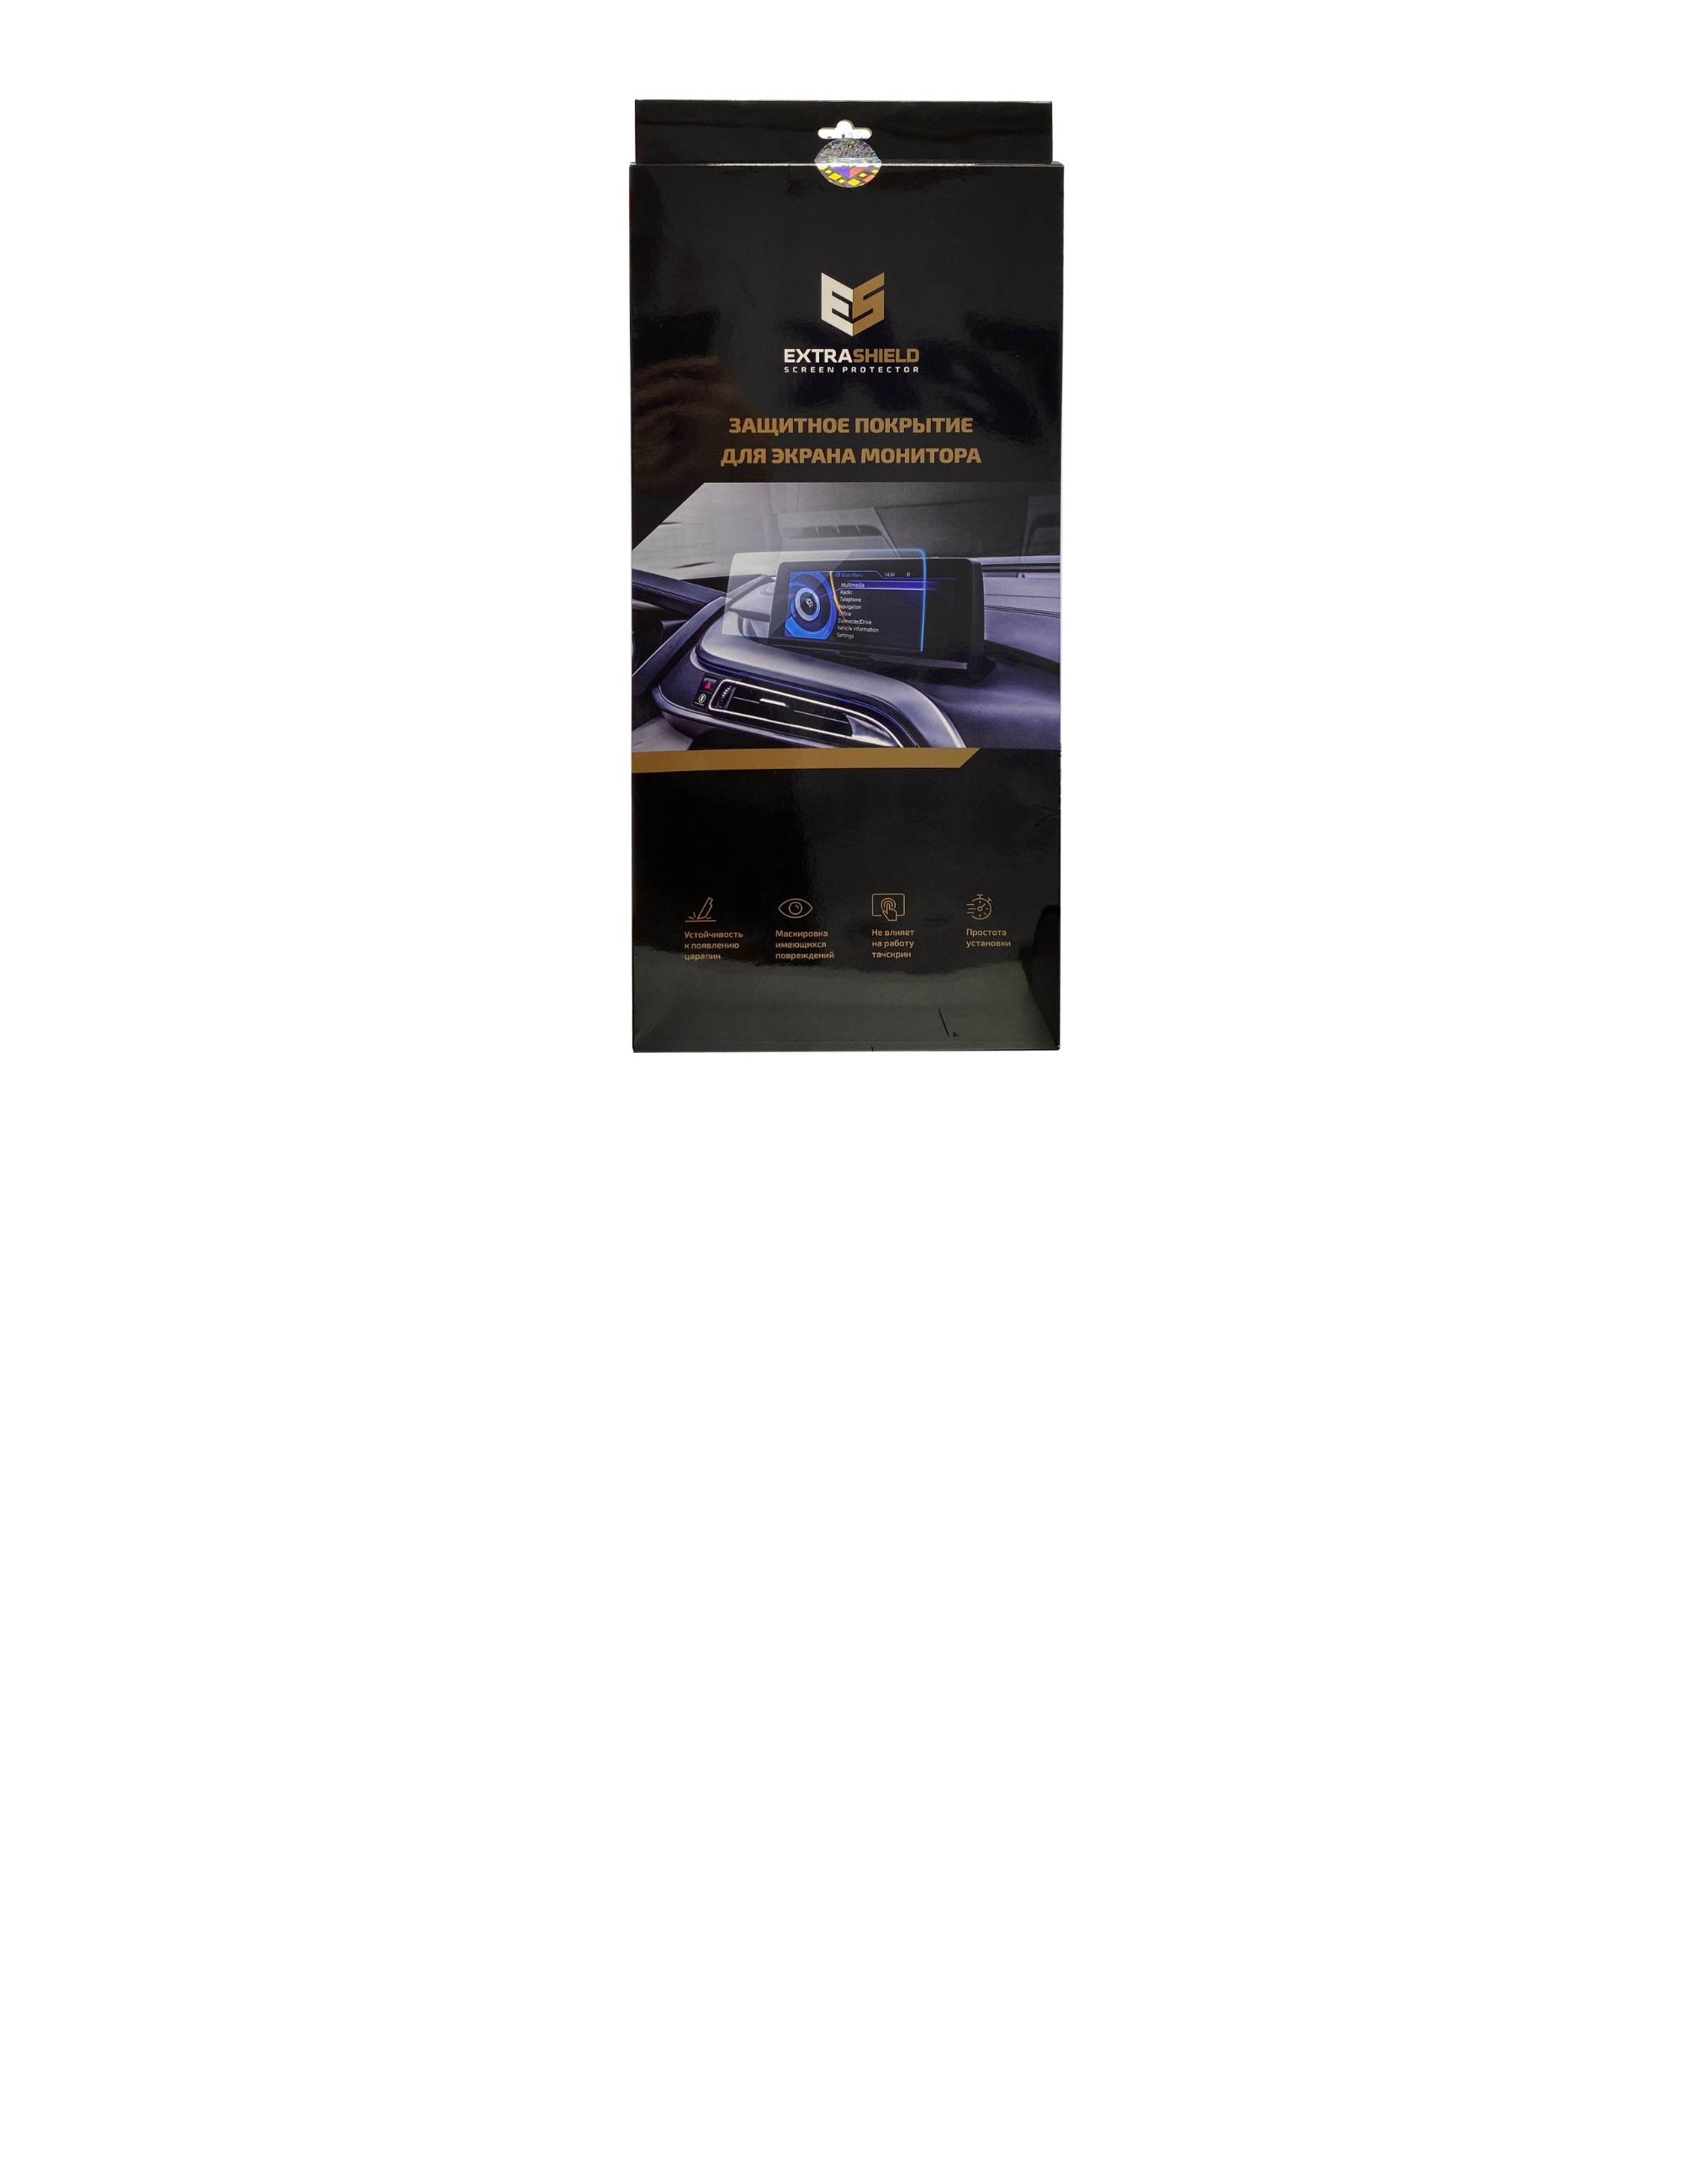 Bentley Mulsanne 2016 - н.в. задние мониторы 9 Статическая пленка Глянец